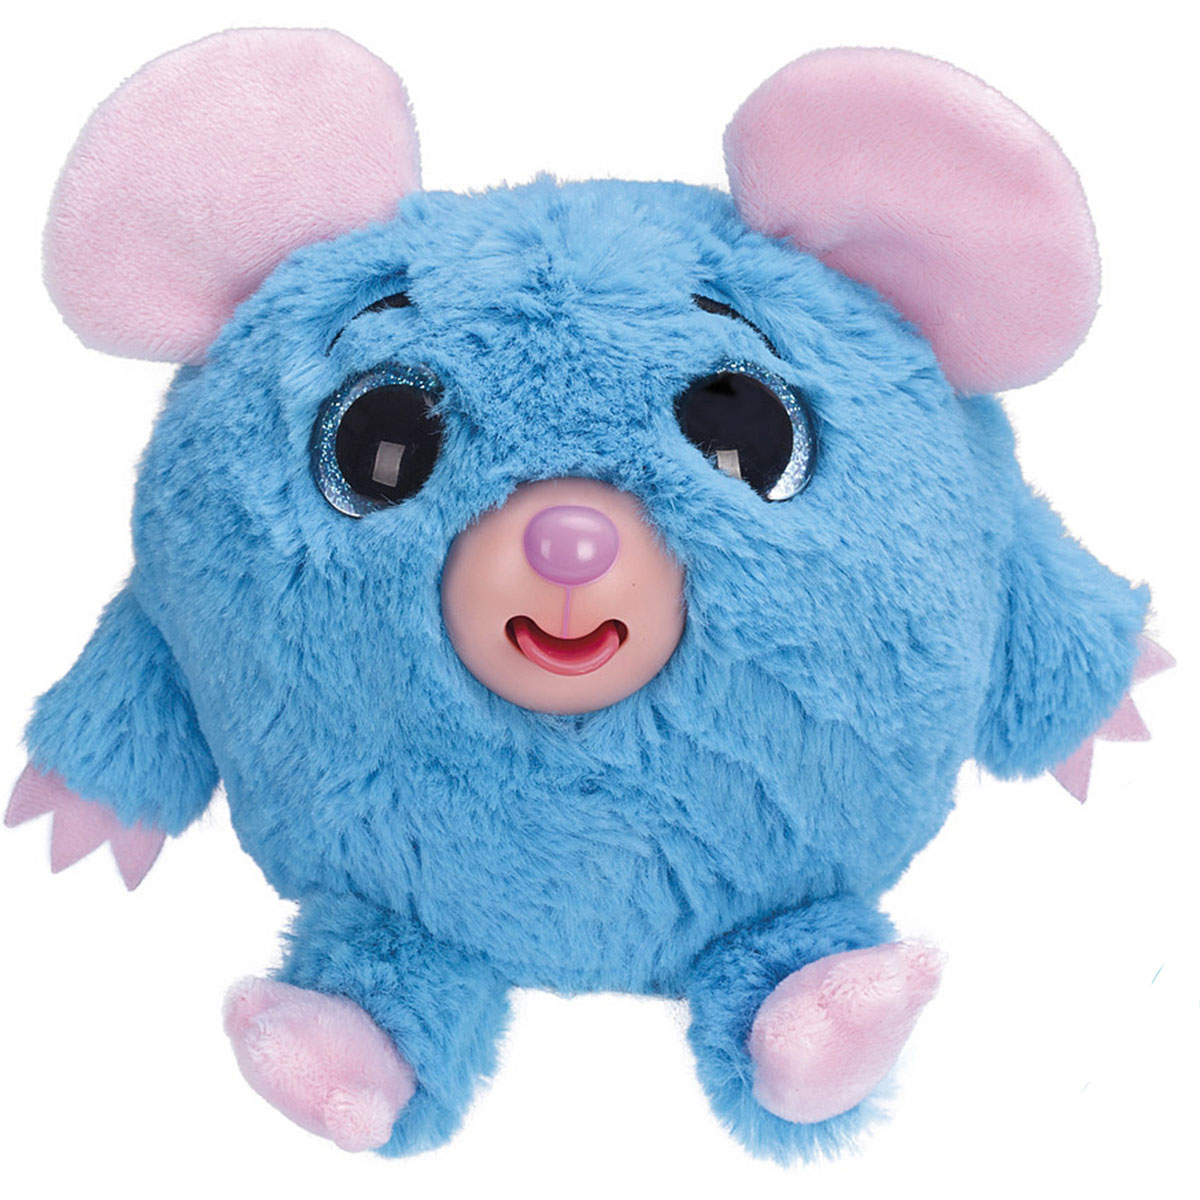 1TOY Мягкая озвученная игрушка Дразнюка-Zooка Мышка 13 см мягкая игрушка кайл 12см с чипом 1toy южный парк